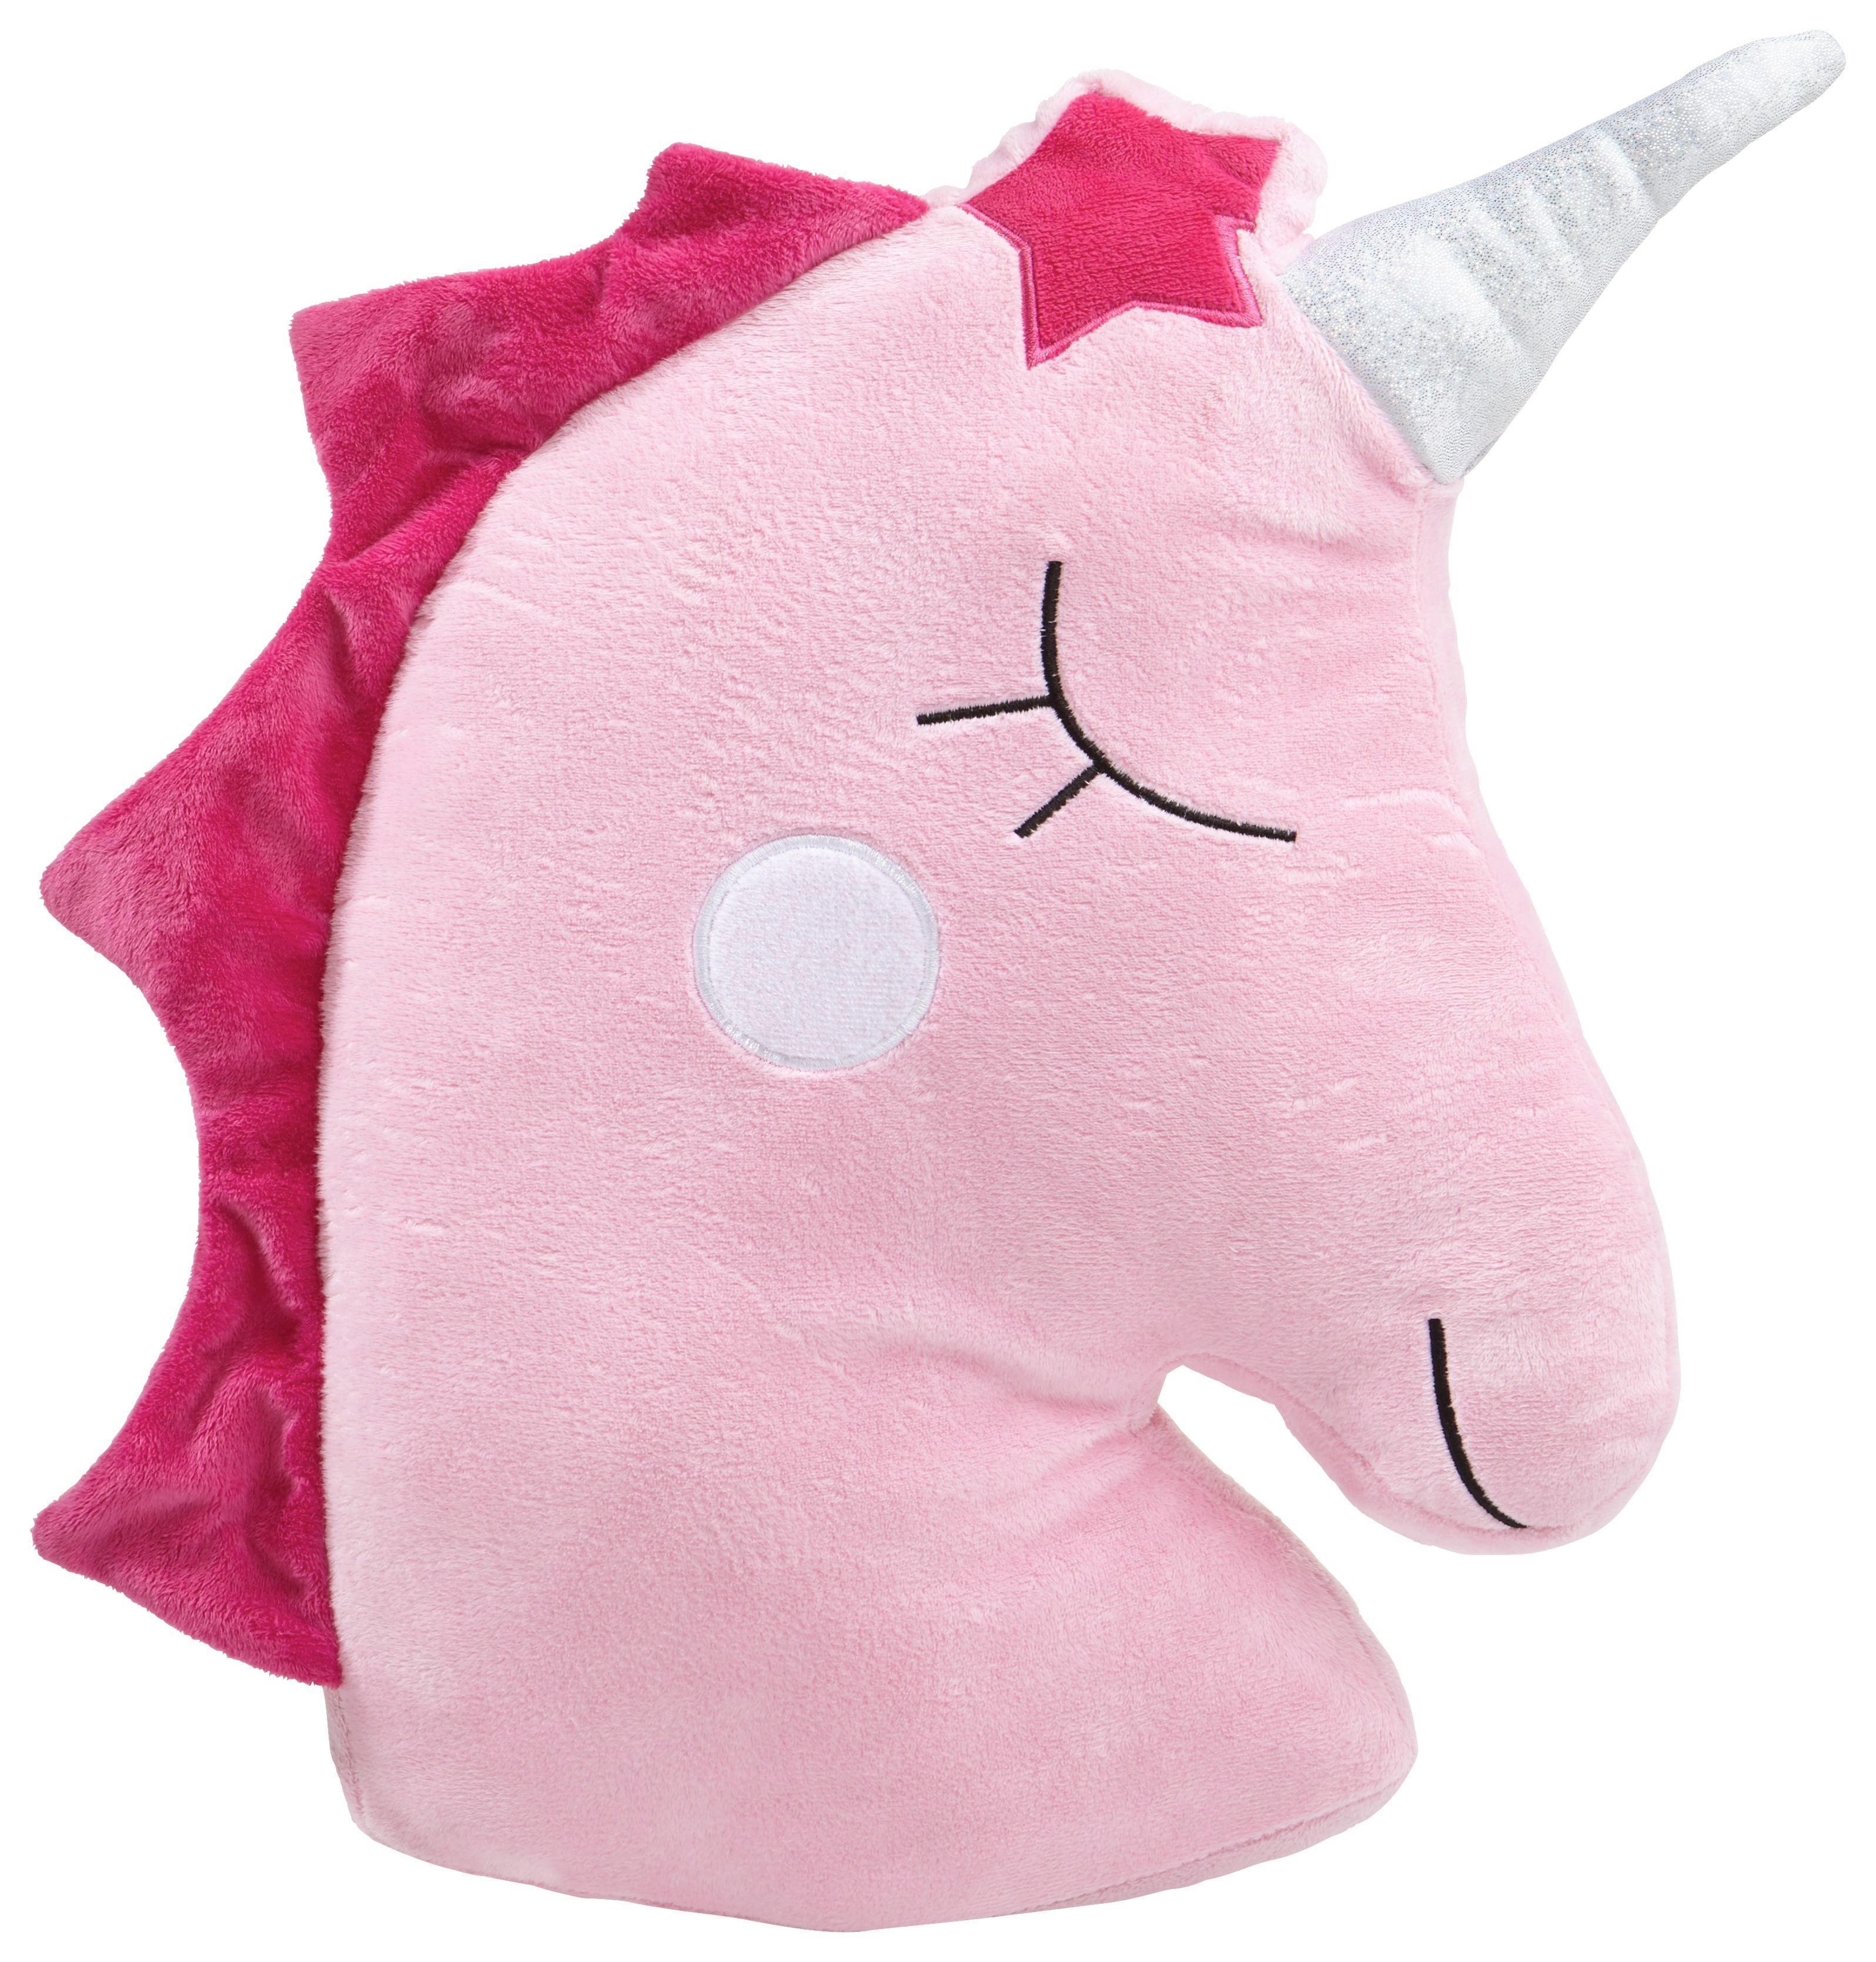 Zierkissen Unicorn in Rosa, ca. 45cm - Pink/Rosa, LIFESTYLE, Textil (45cm) - MÖMAX modern living